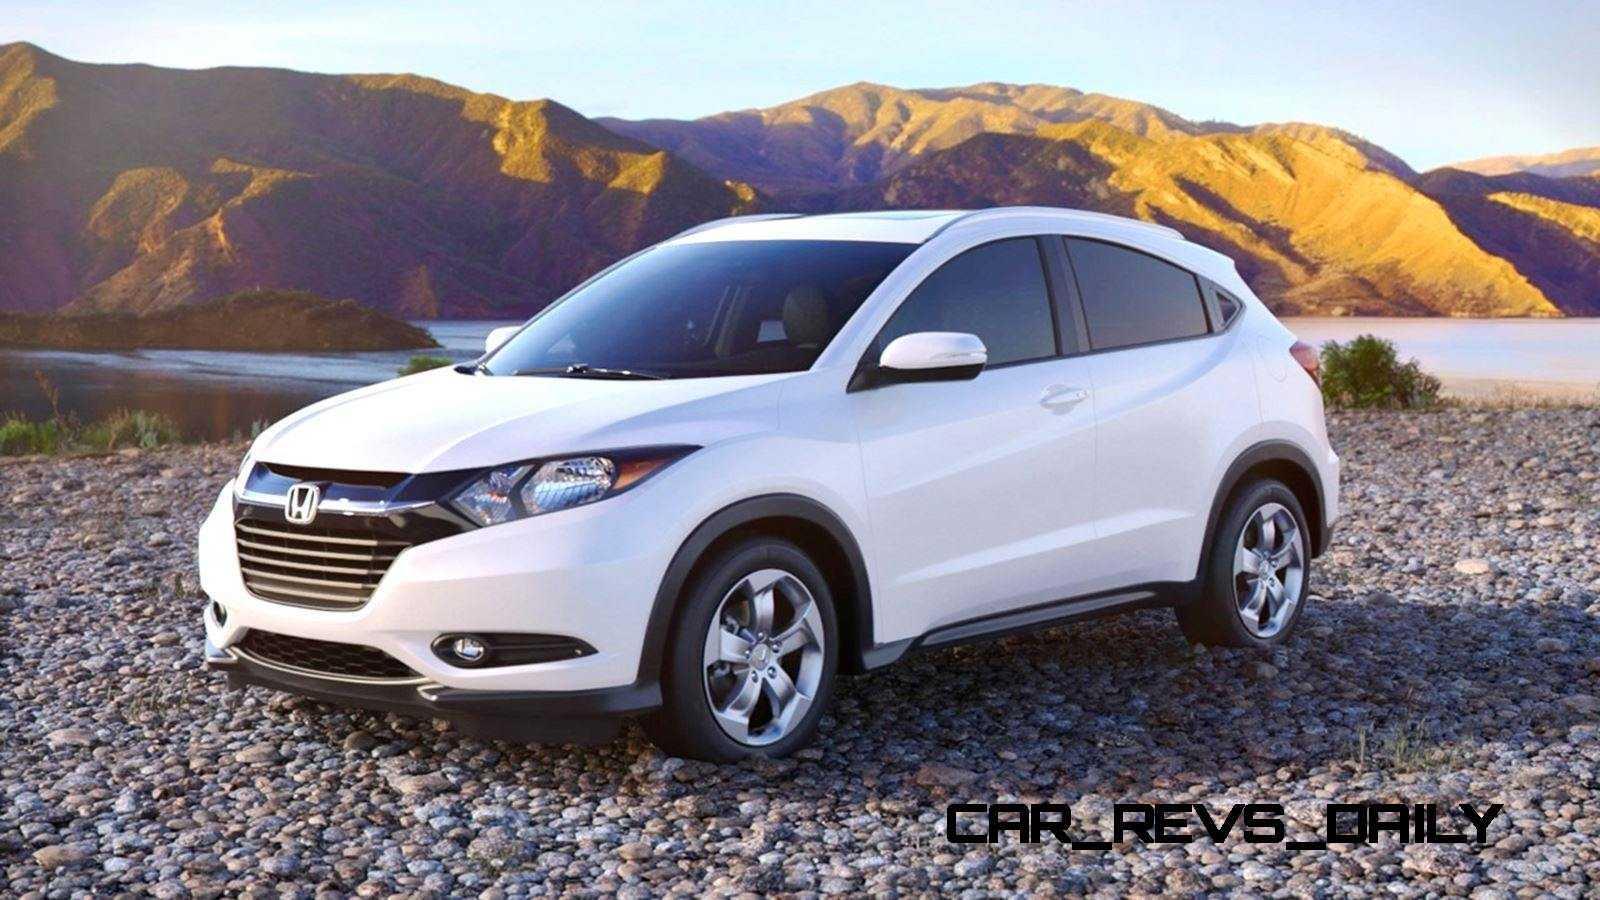 2017 Honda Civic Ground Clearance | 2017 - 2018 Cars Reviews